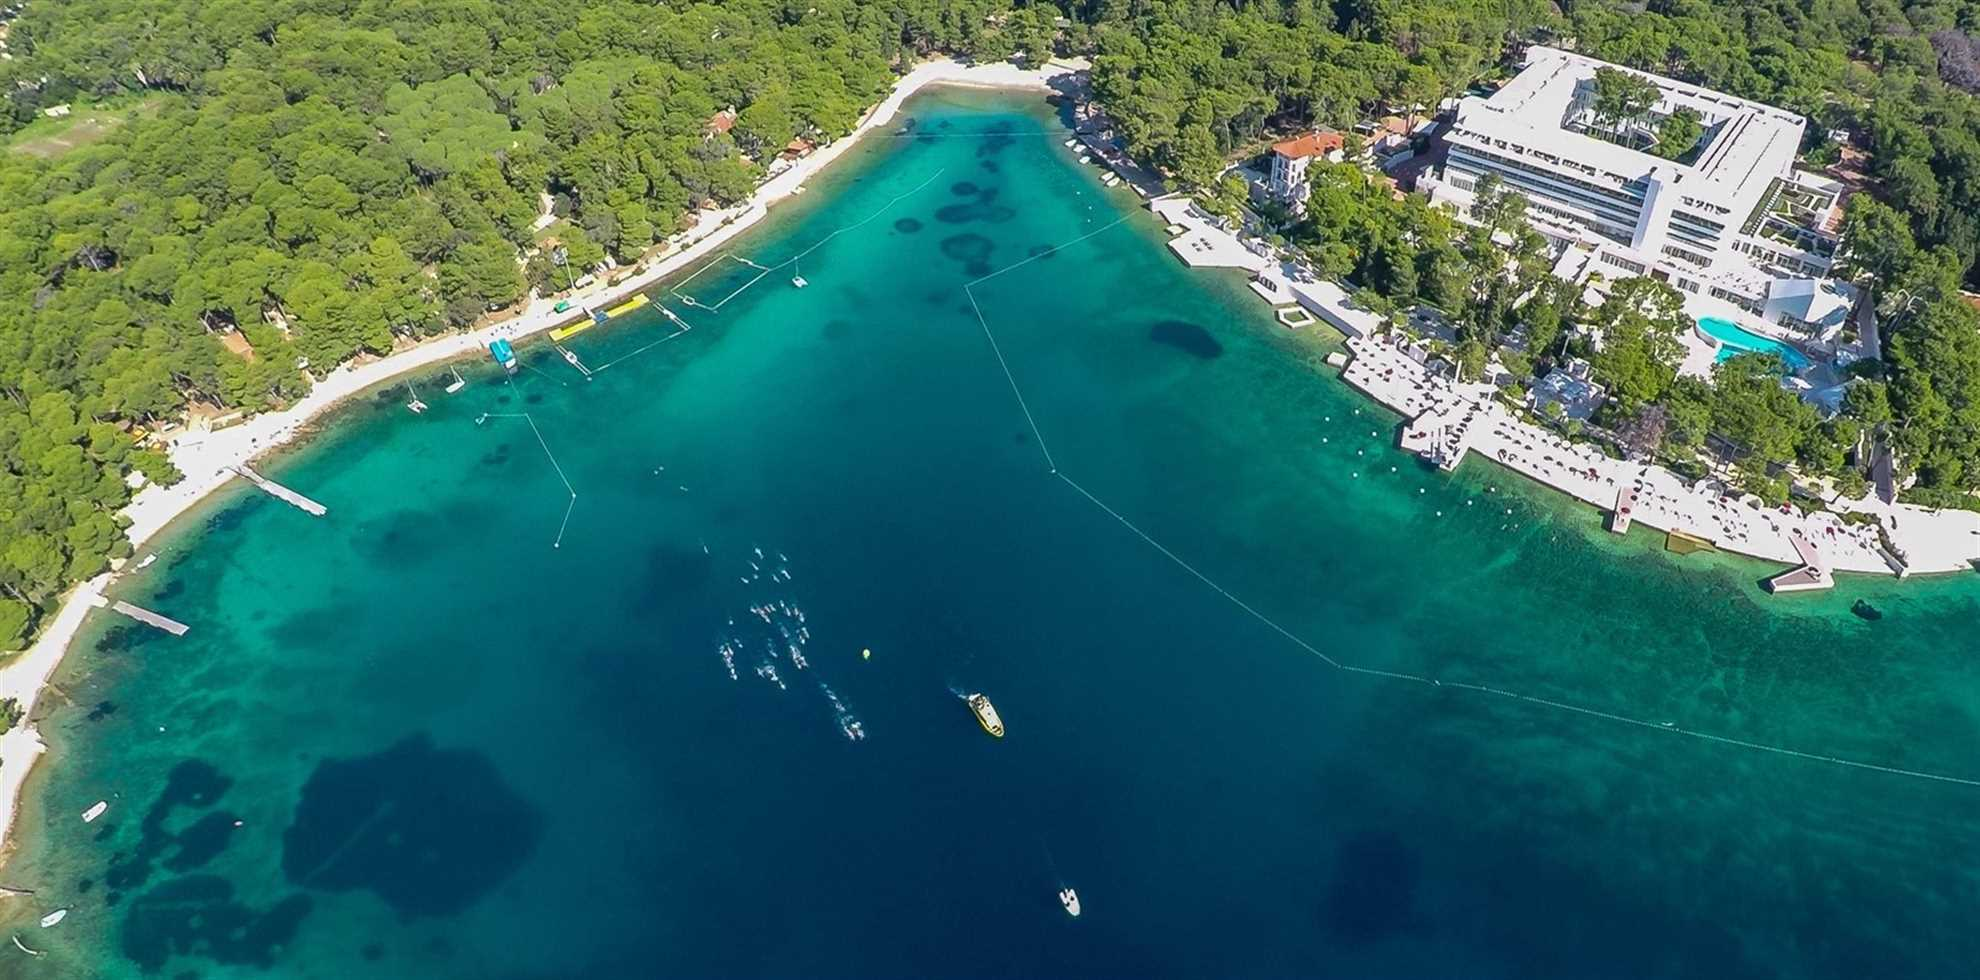 Cikat Bay in Croatia